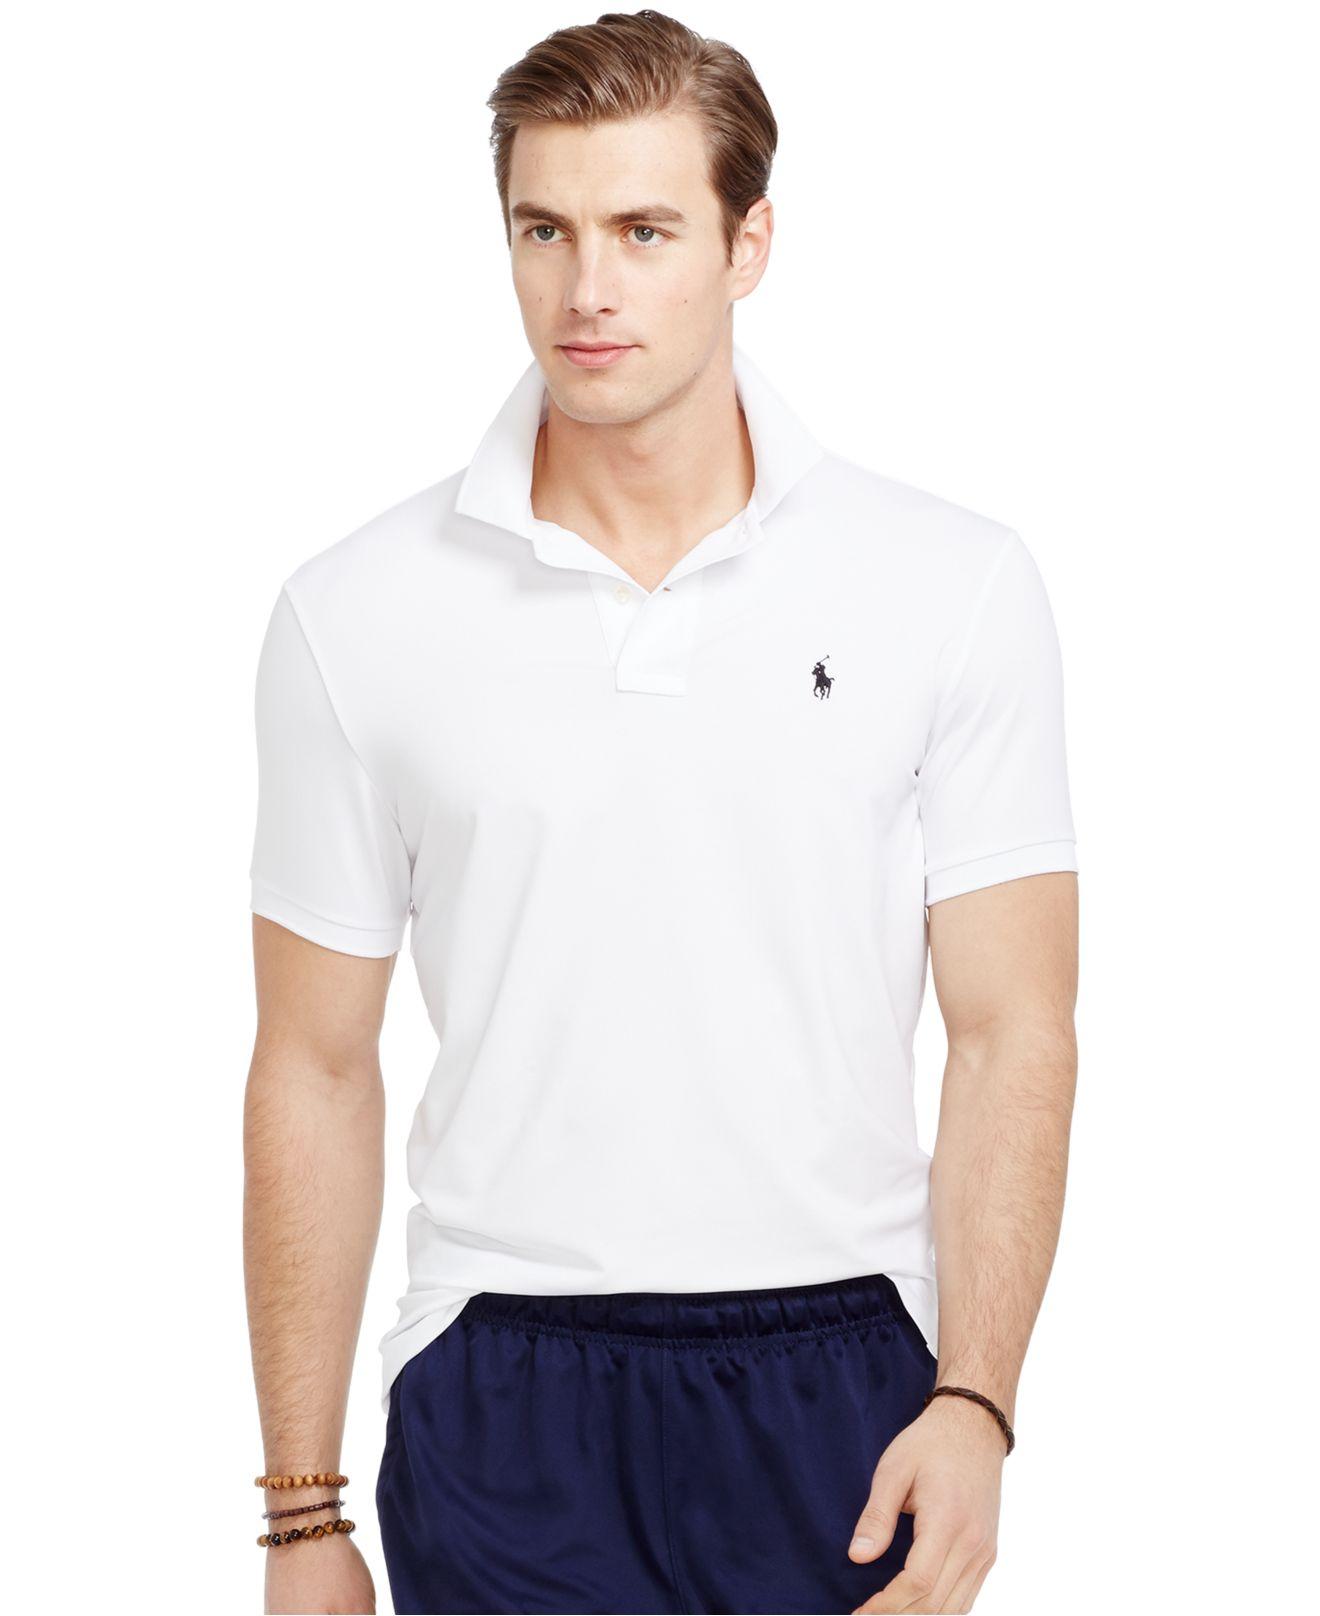 17235fe6aeb2 ... good lyst polo ralph lauren performance polo shirt in white for men  59c73 0ef30